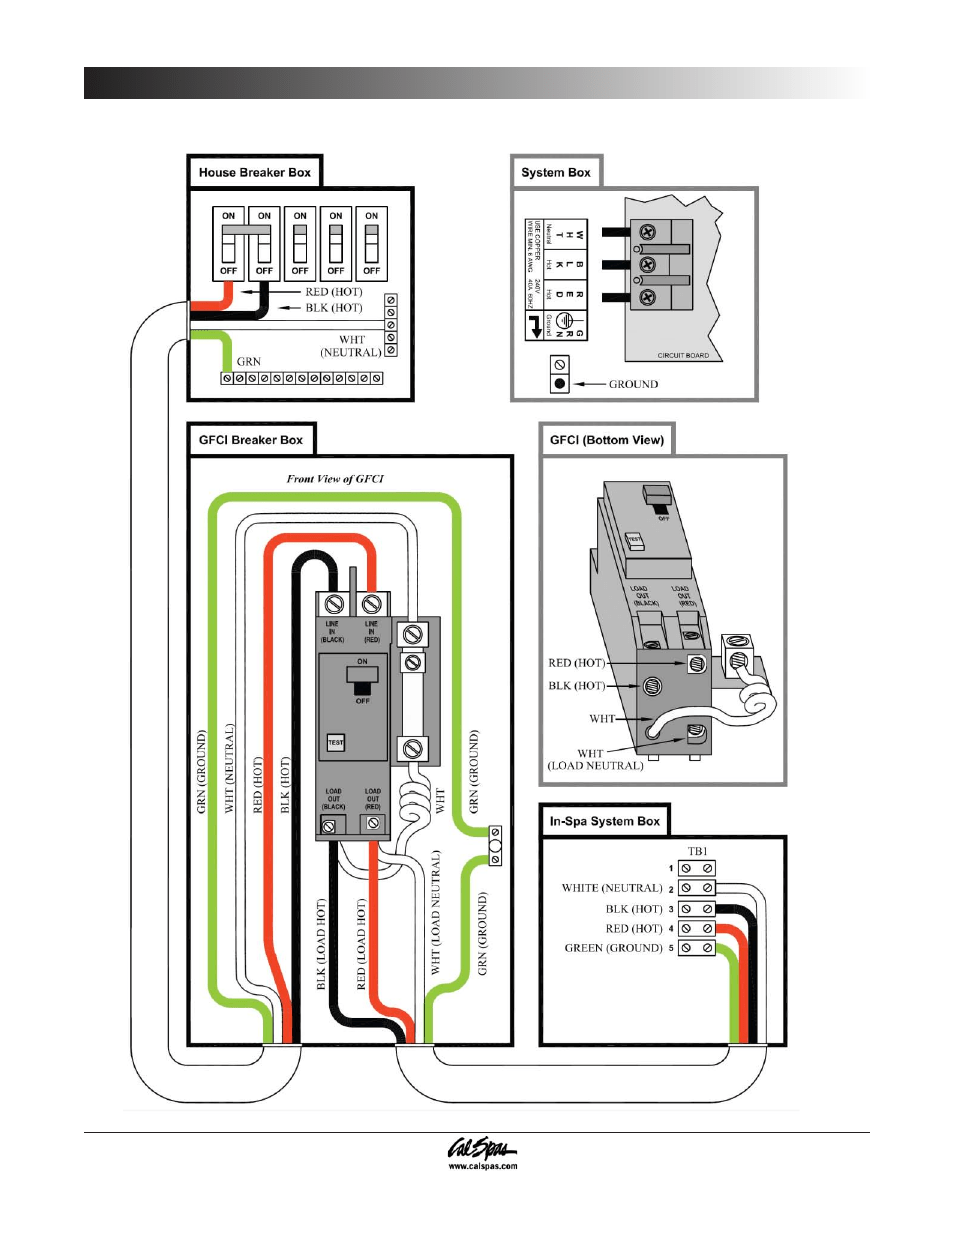 1996 cal spa wiring diagram vdo marine oil pressure gauge and schematics modern model best images for